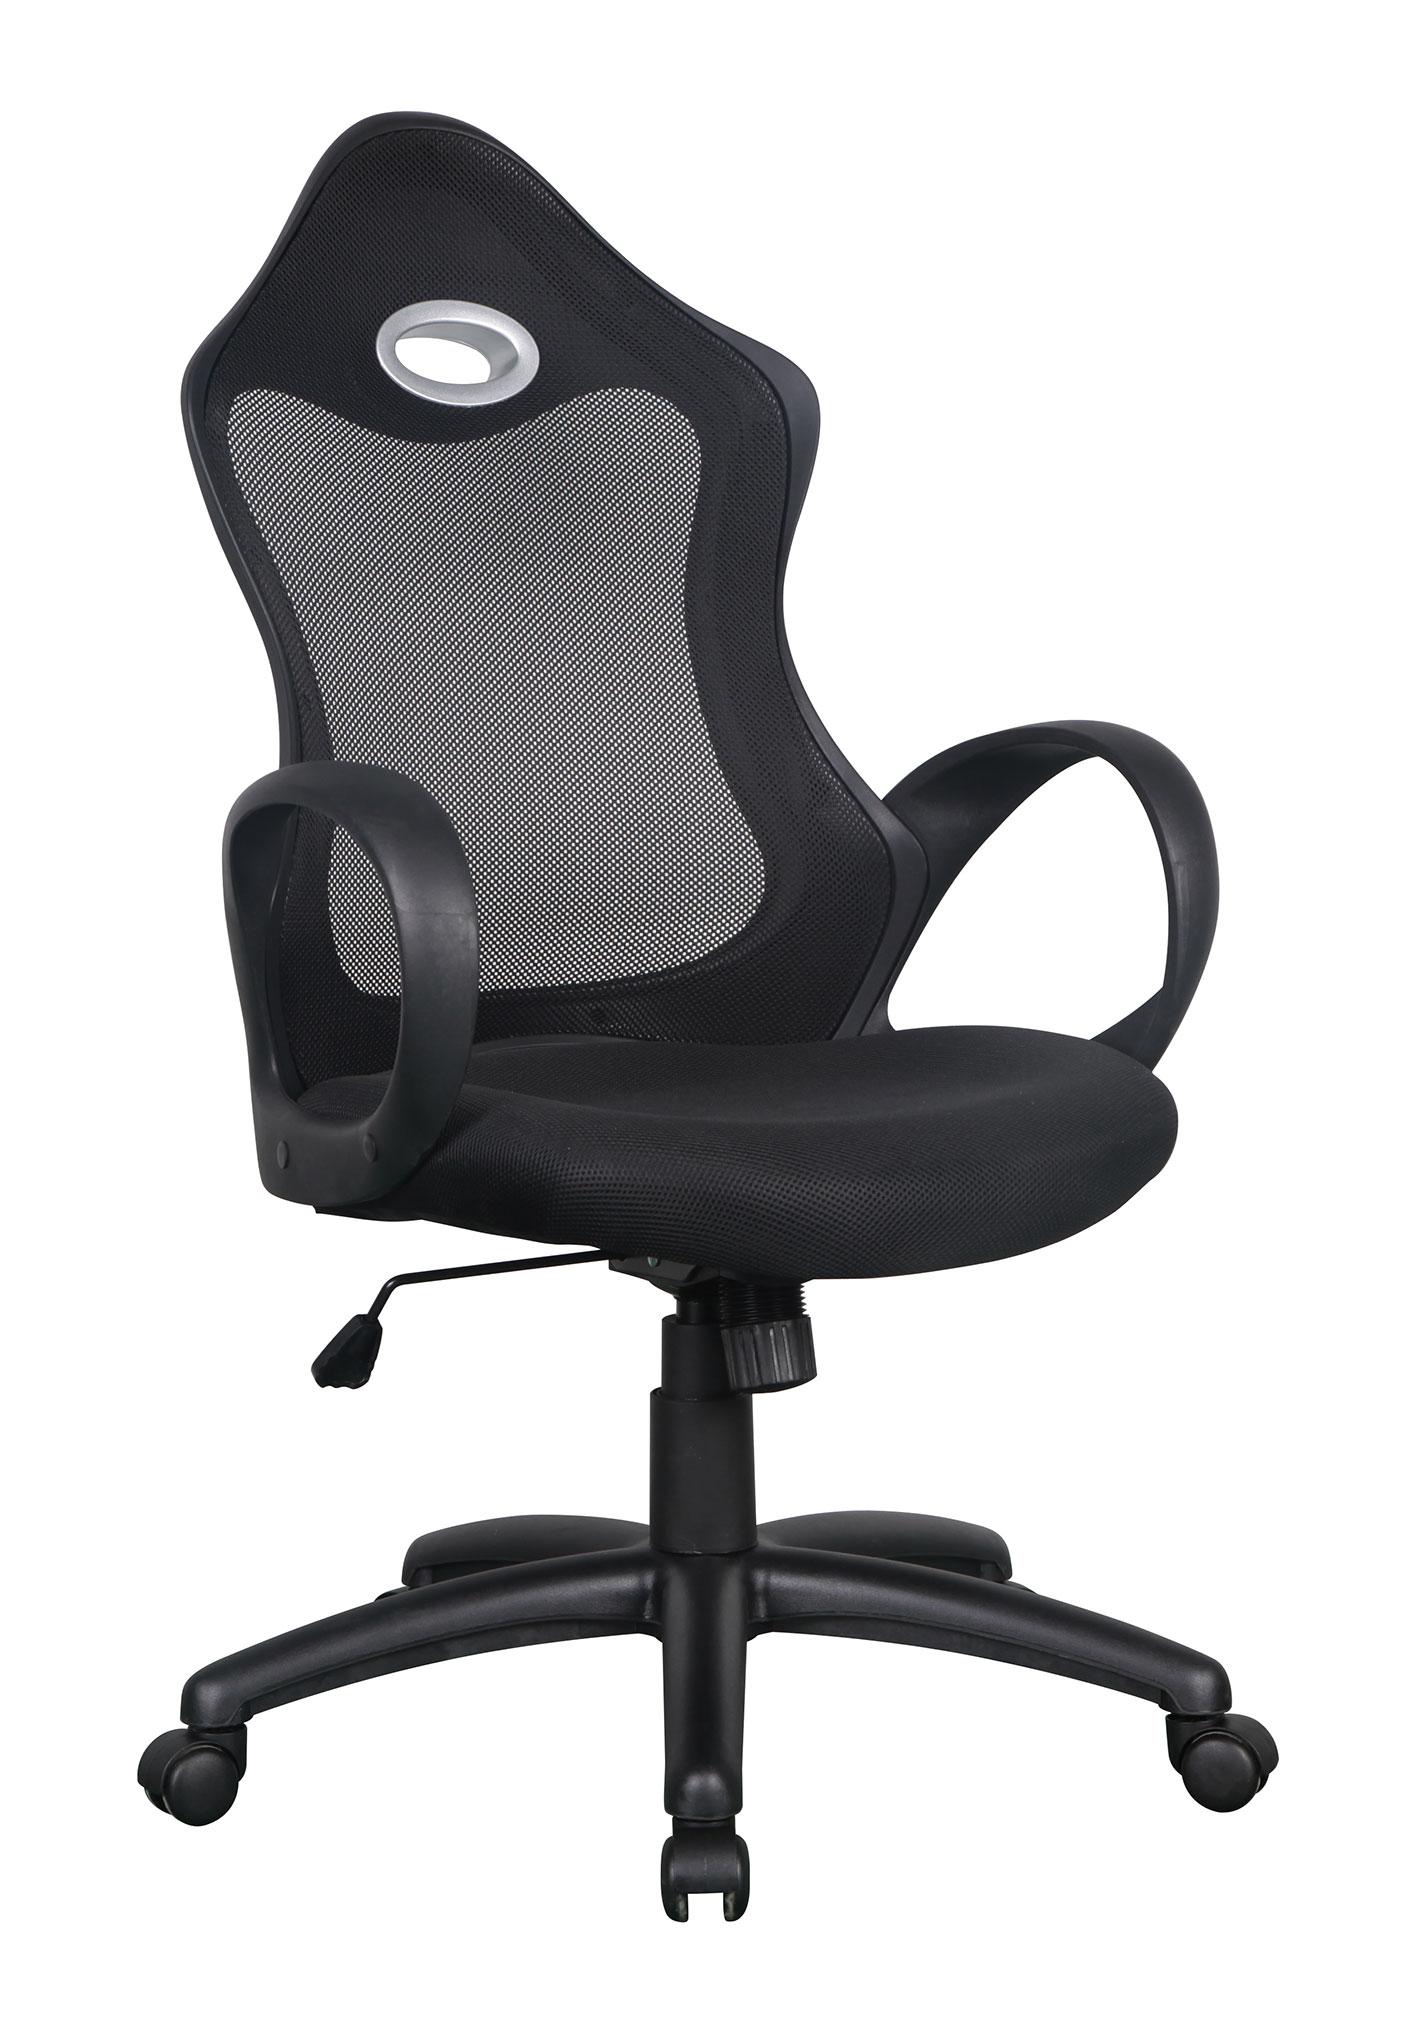 Sixbros chaise de bureau racing pivotante diff rentes - Chaise de bureau racing ...